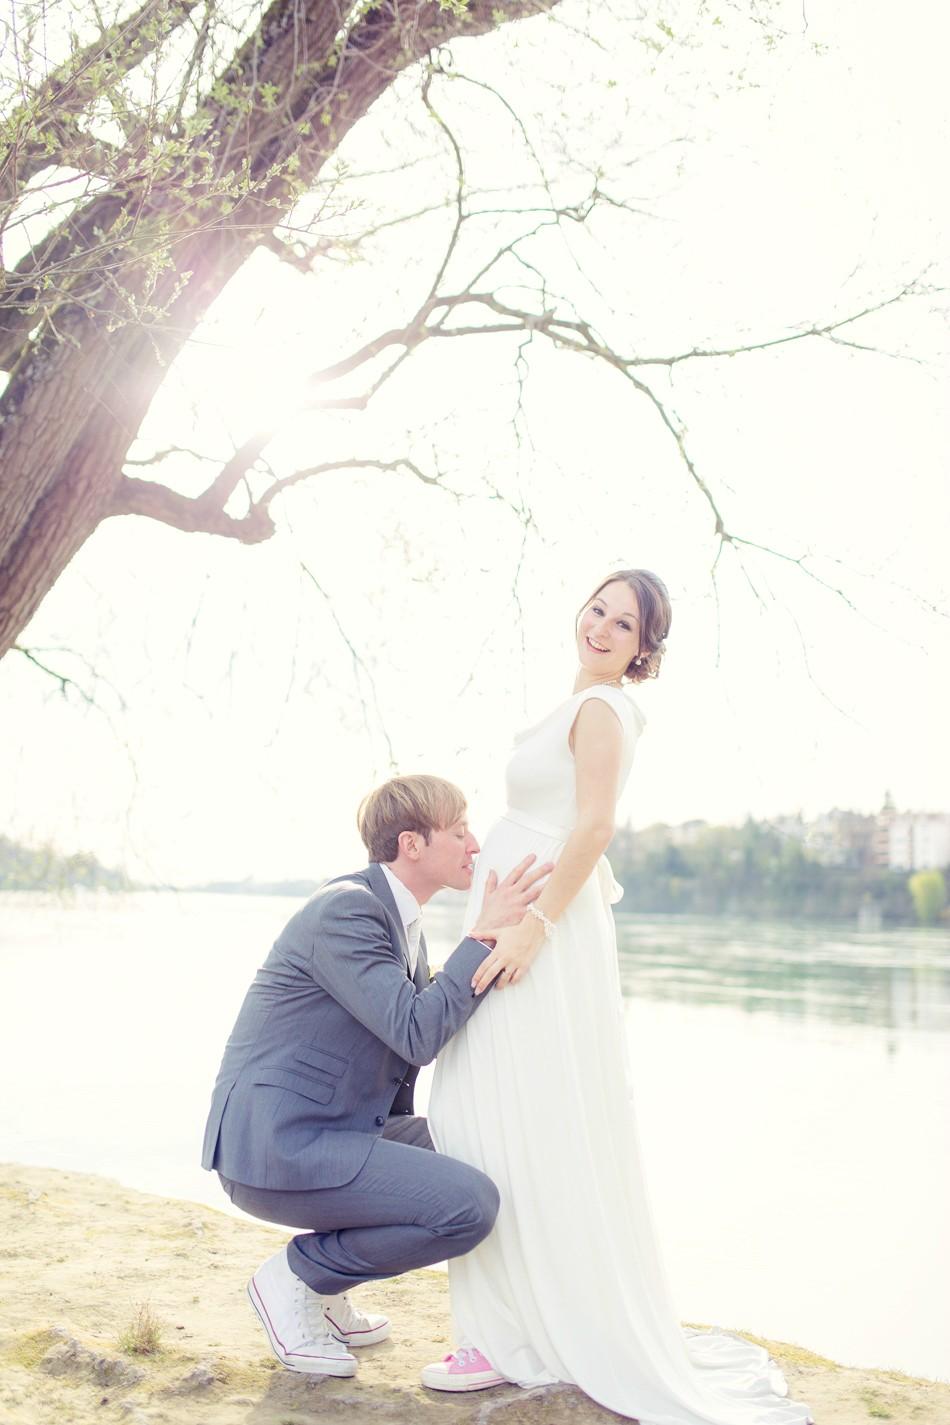 Brautpaarshooting-Inseli-Vintage-Fotograf-Vintage (3 von 4)